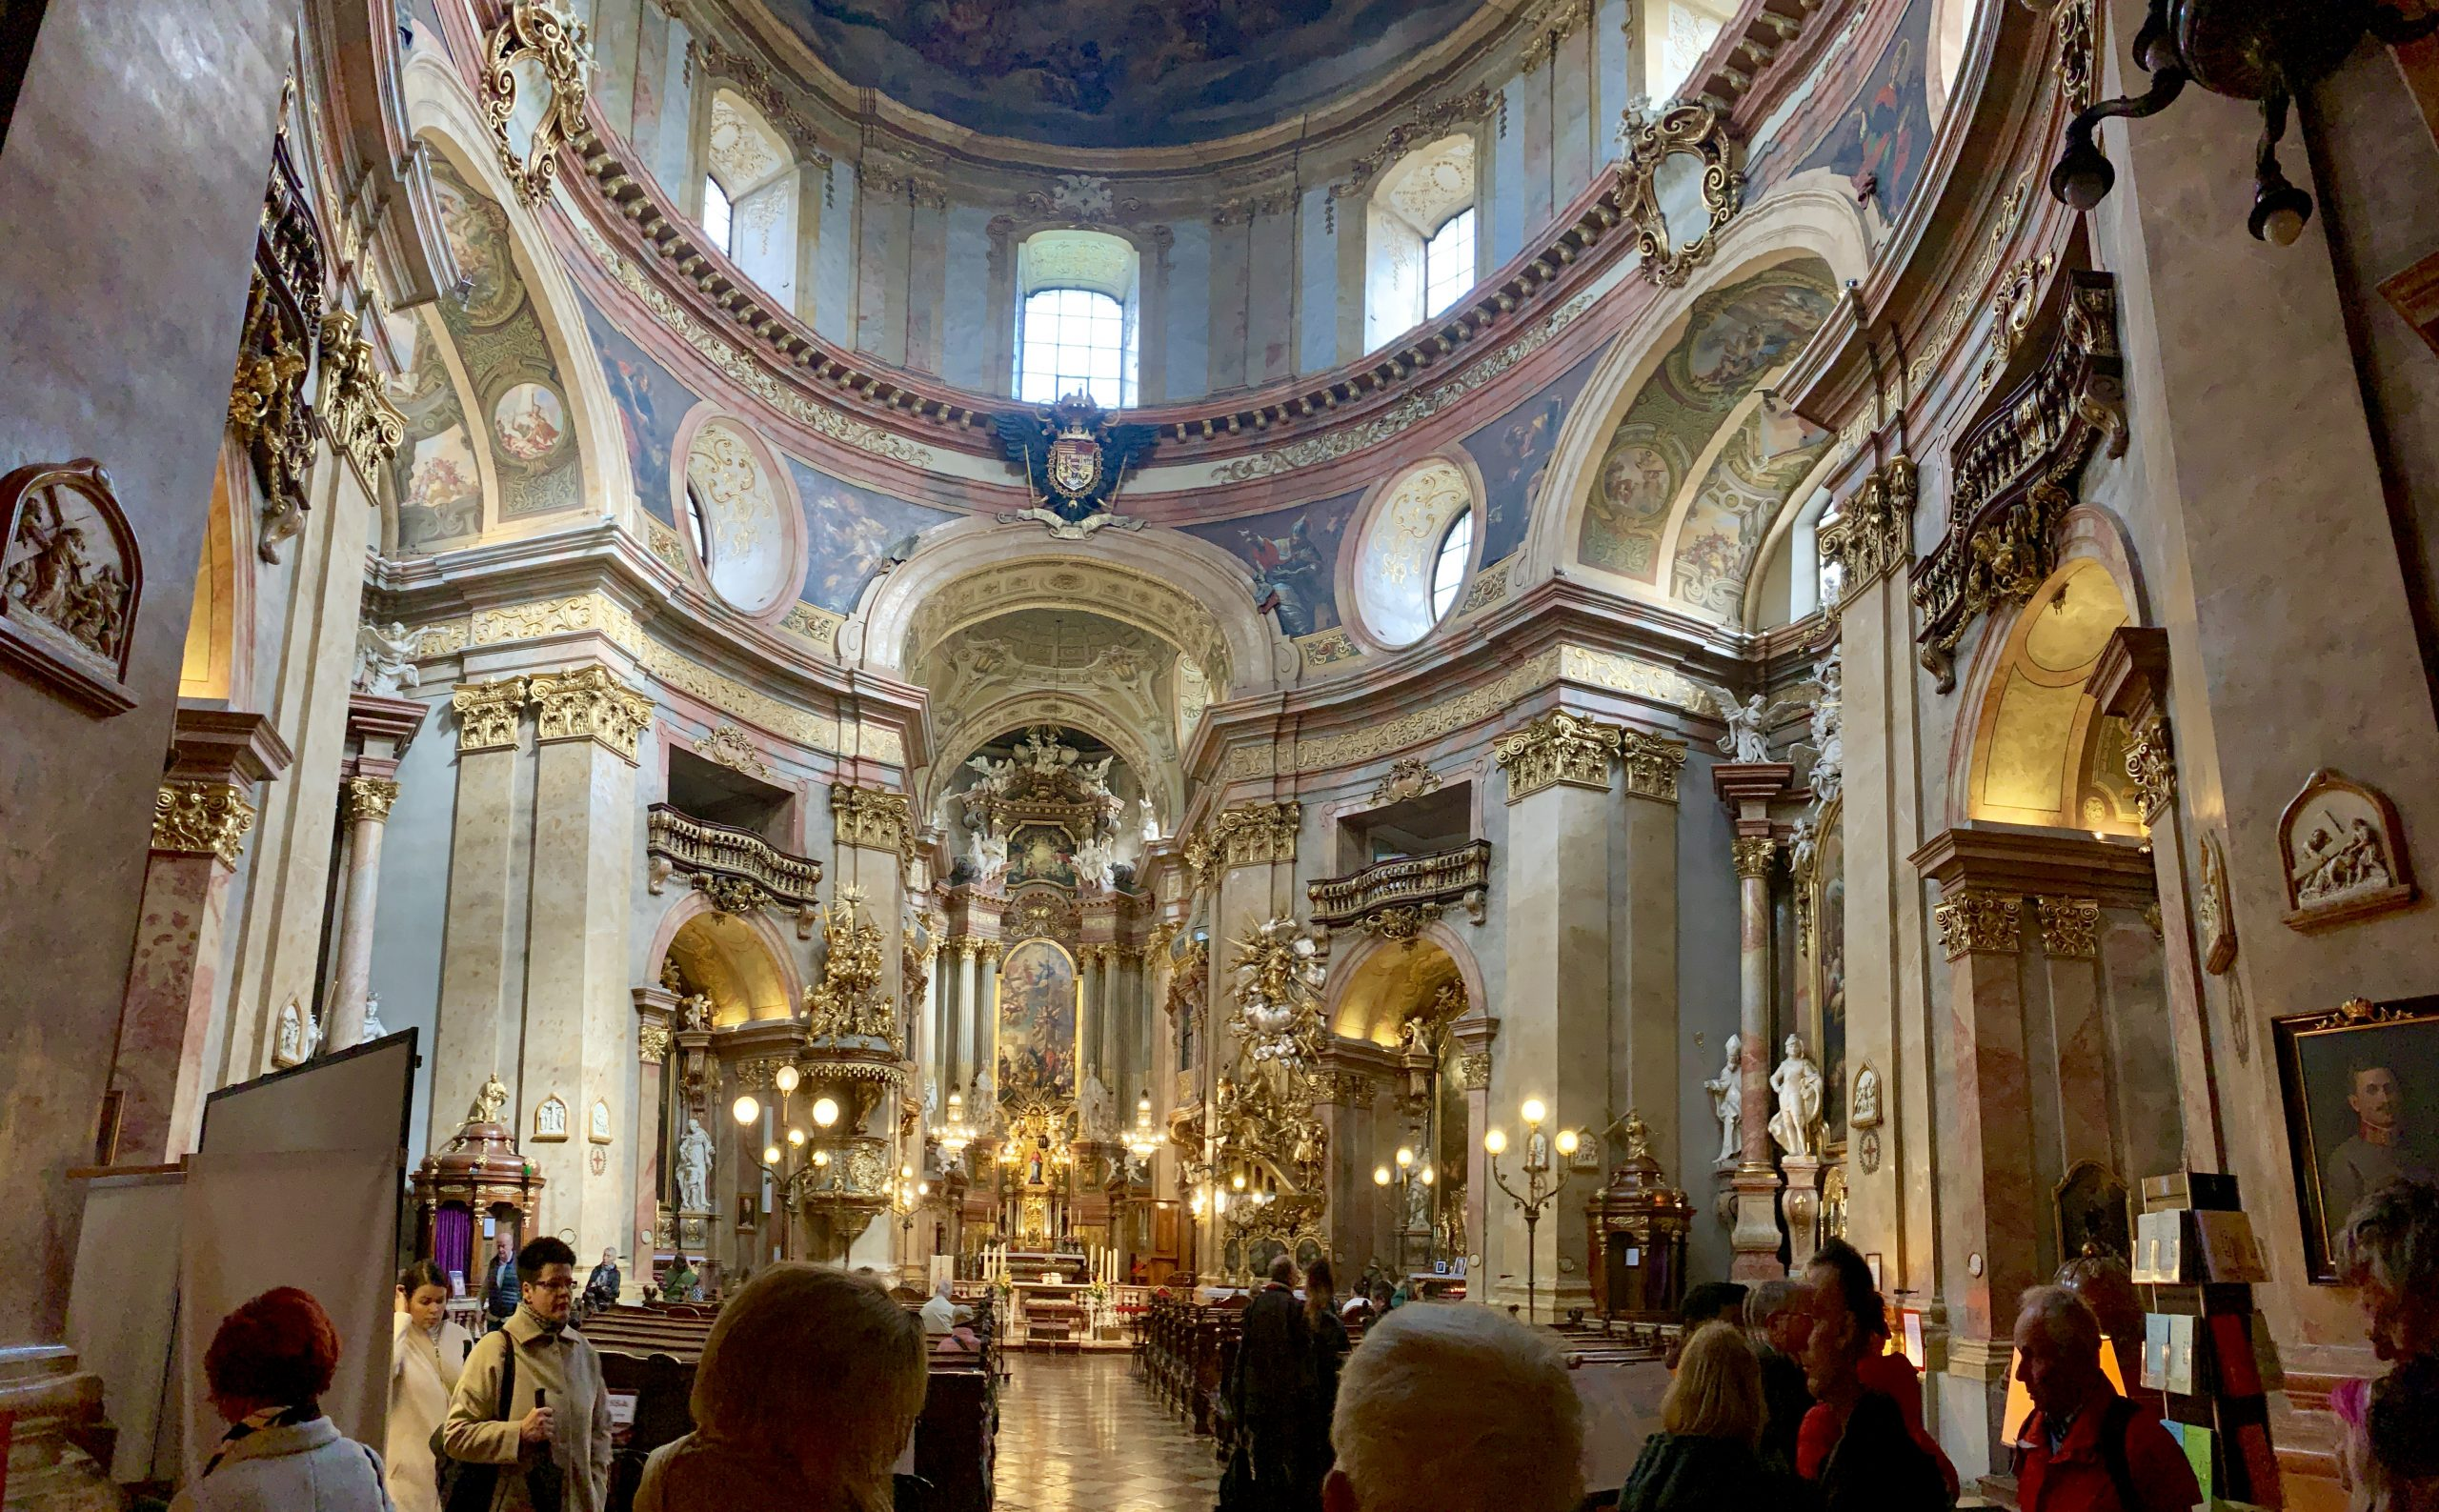 st peter's church vienna